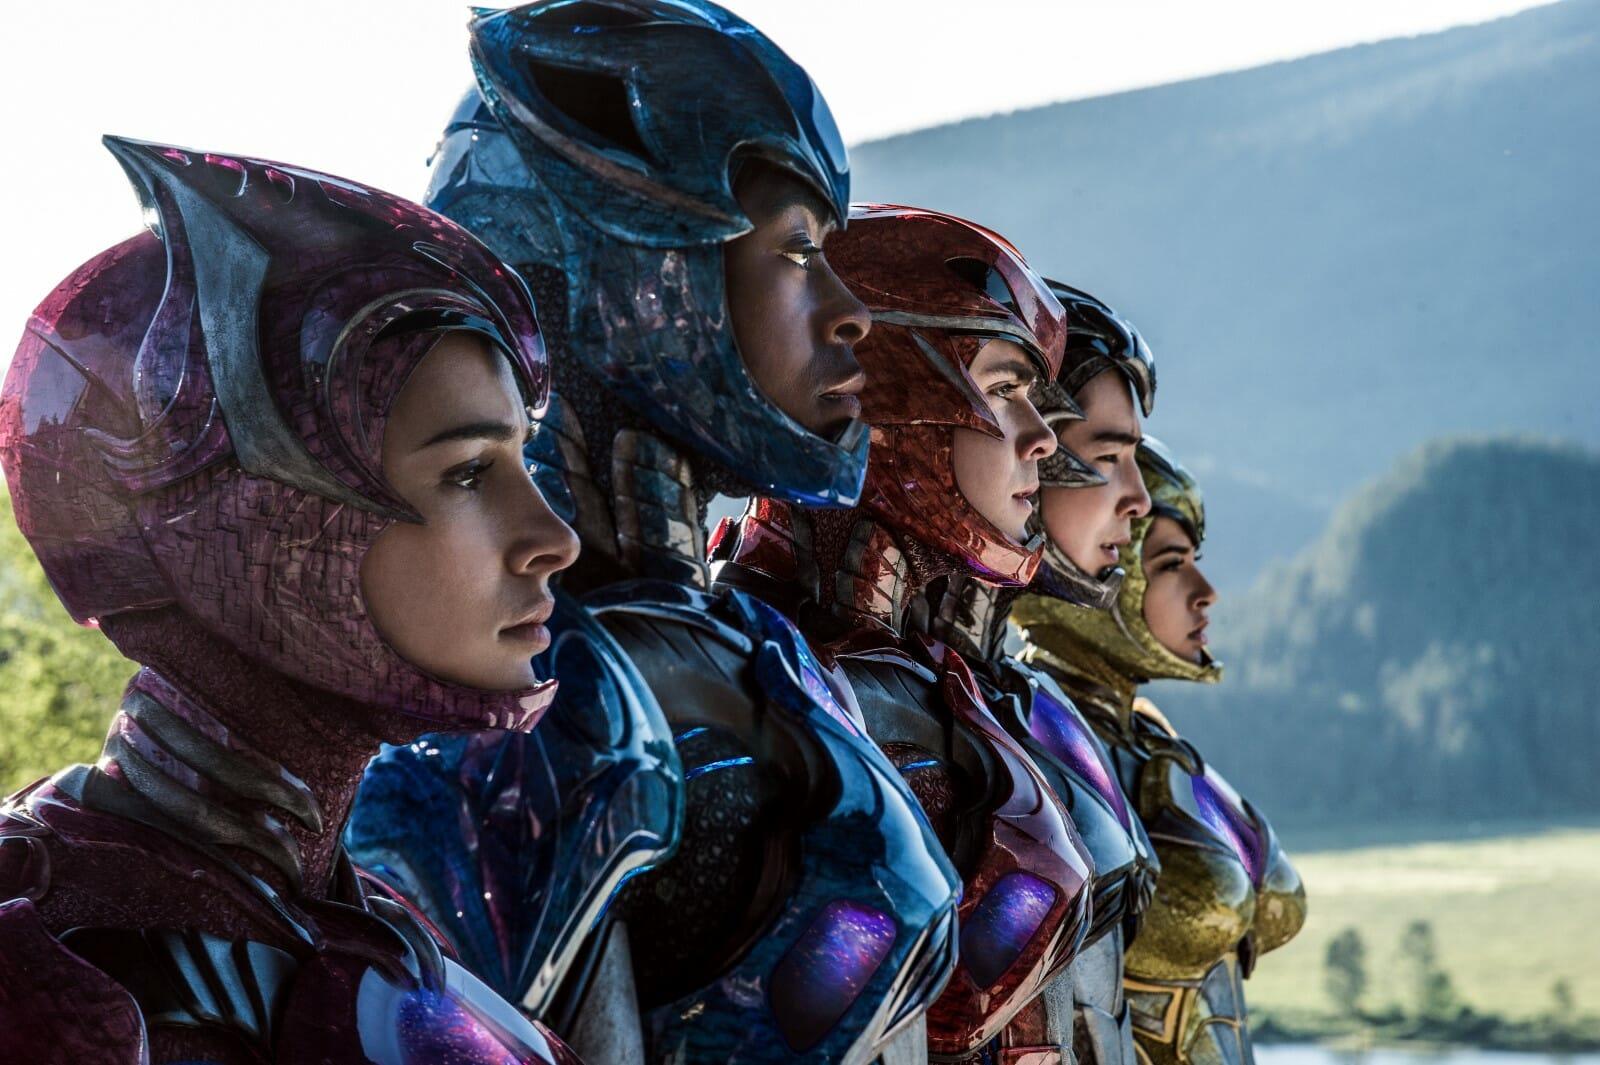 Power-Rangers-cast